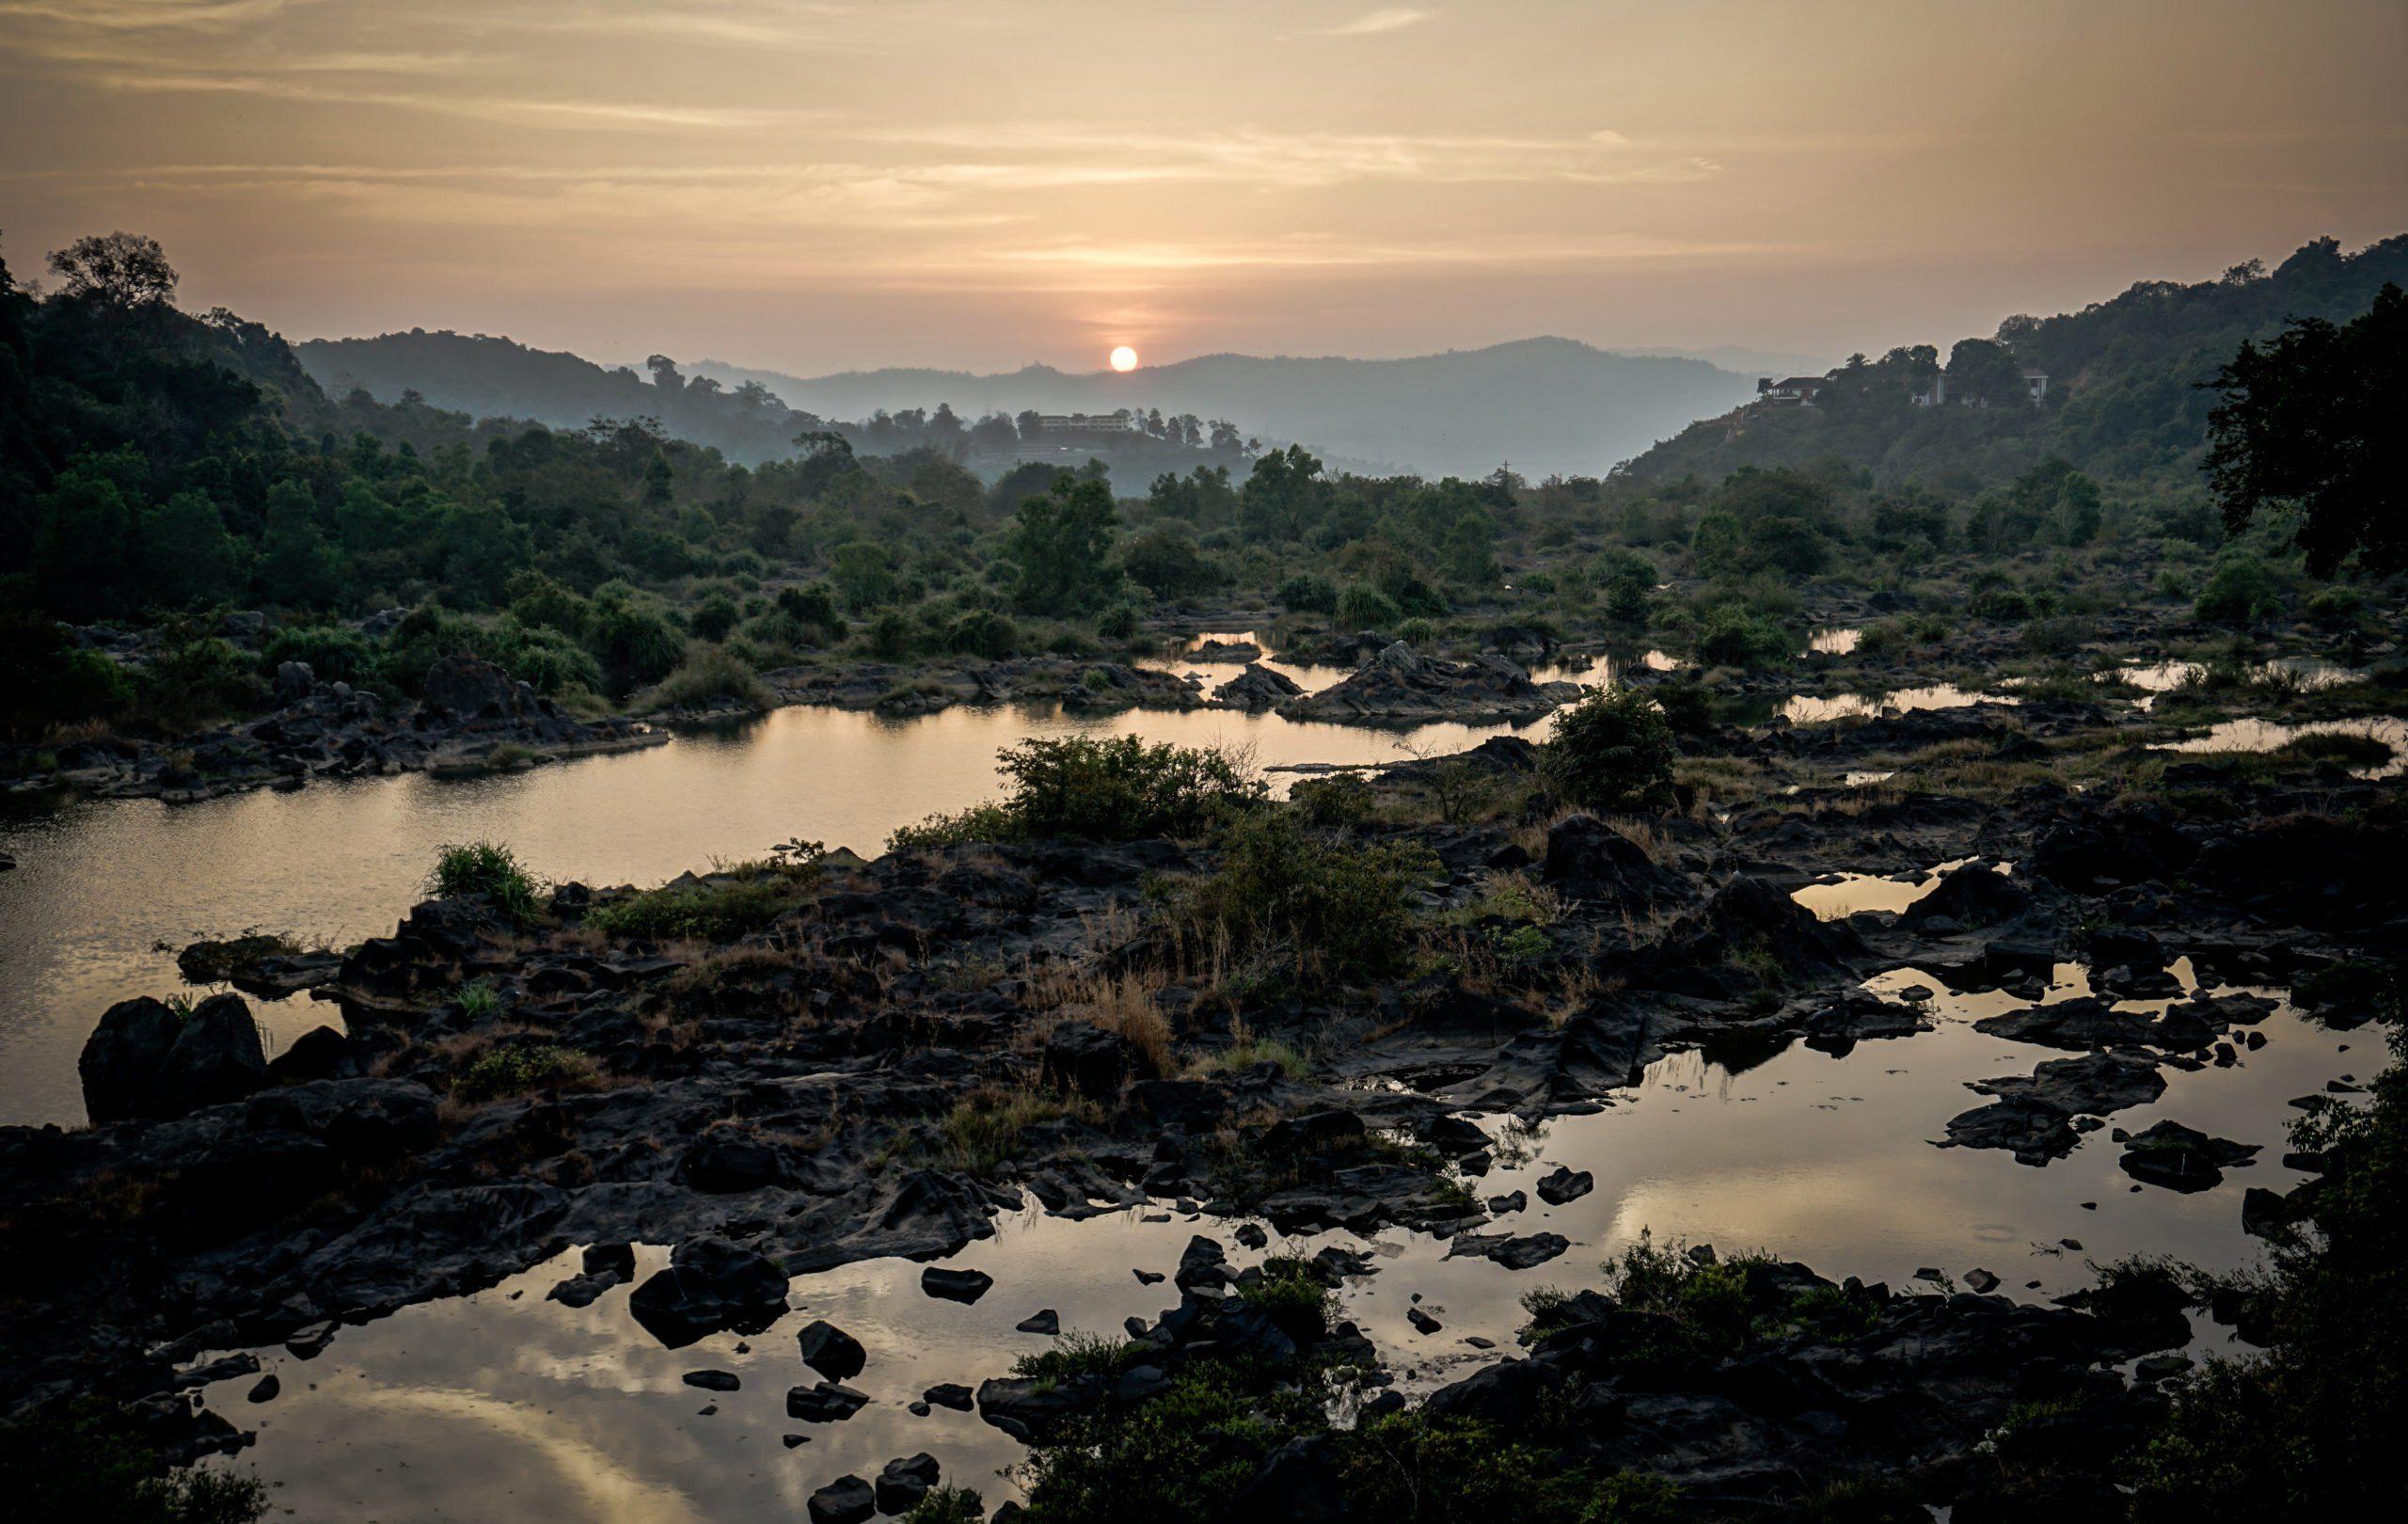 sunset south india